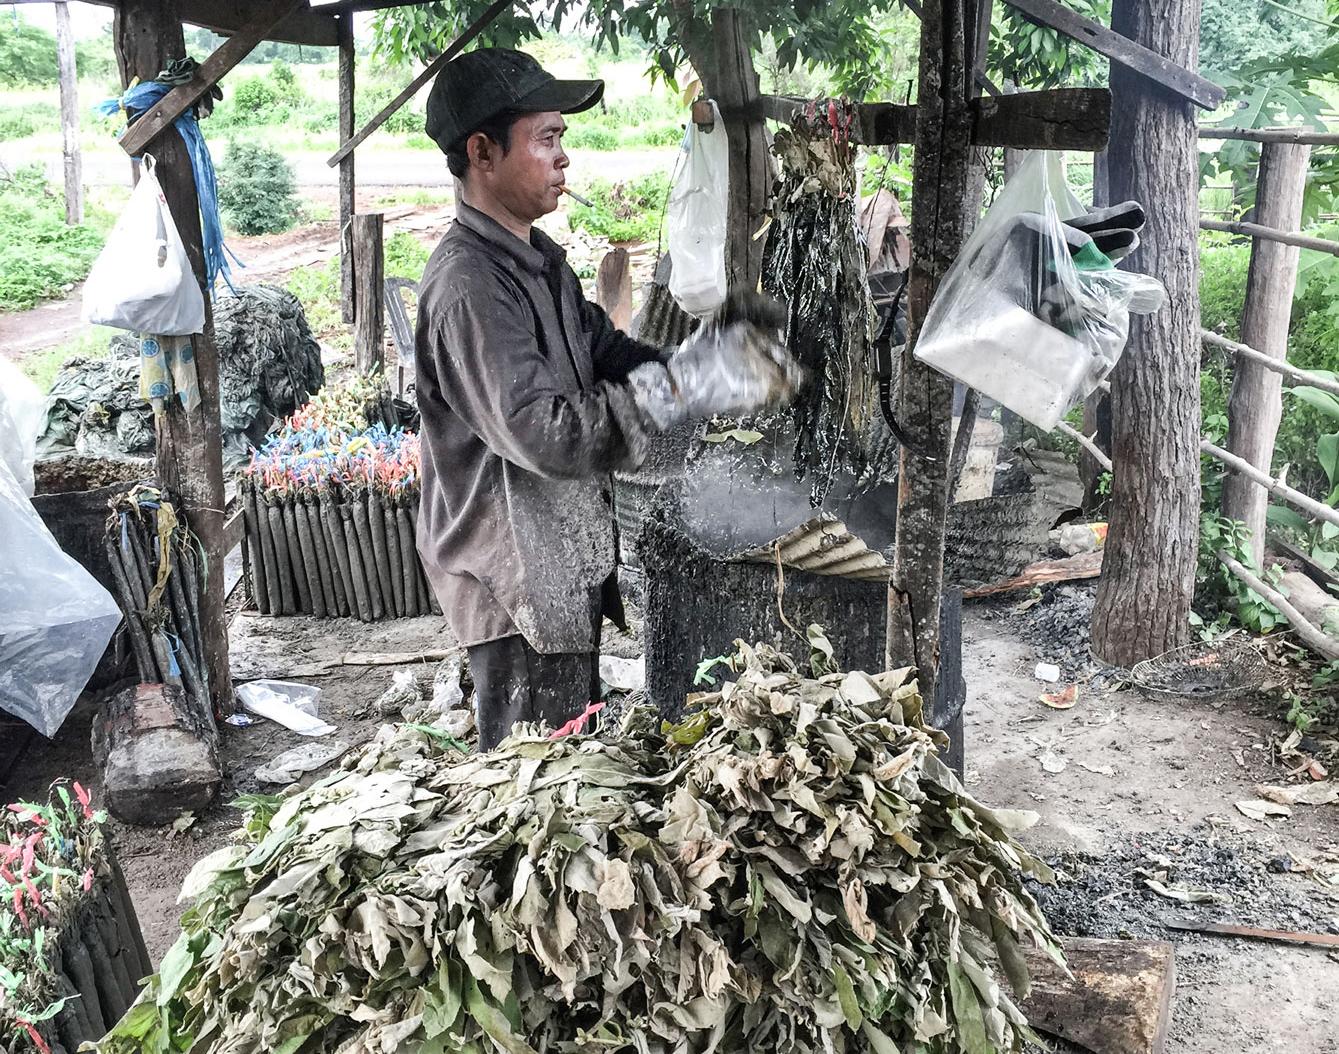 20161027_cambodia_resin_torches_yos_katank_img_8408-1-web